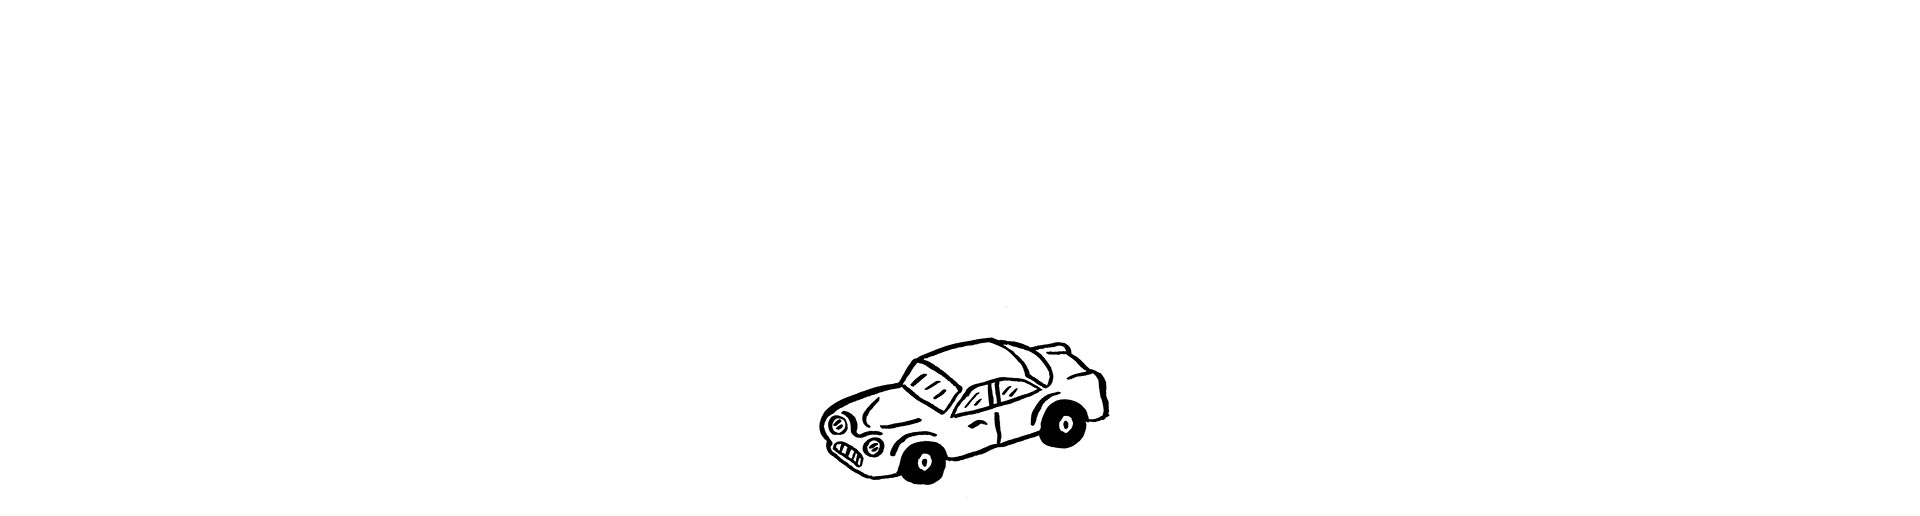 DPNK_ilustrace-data_03